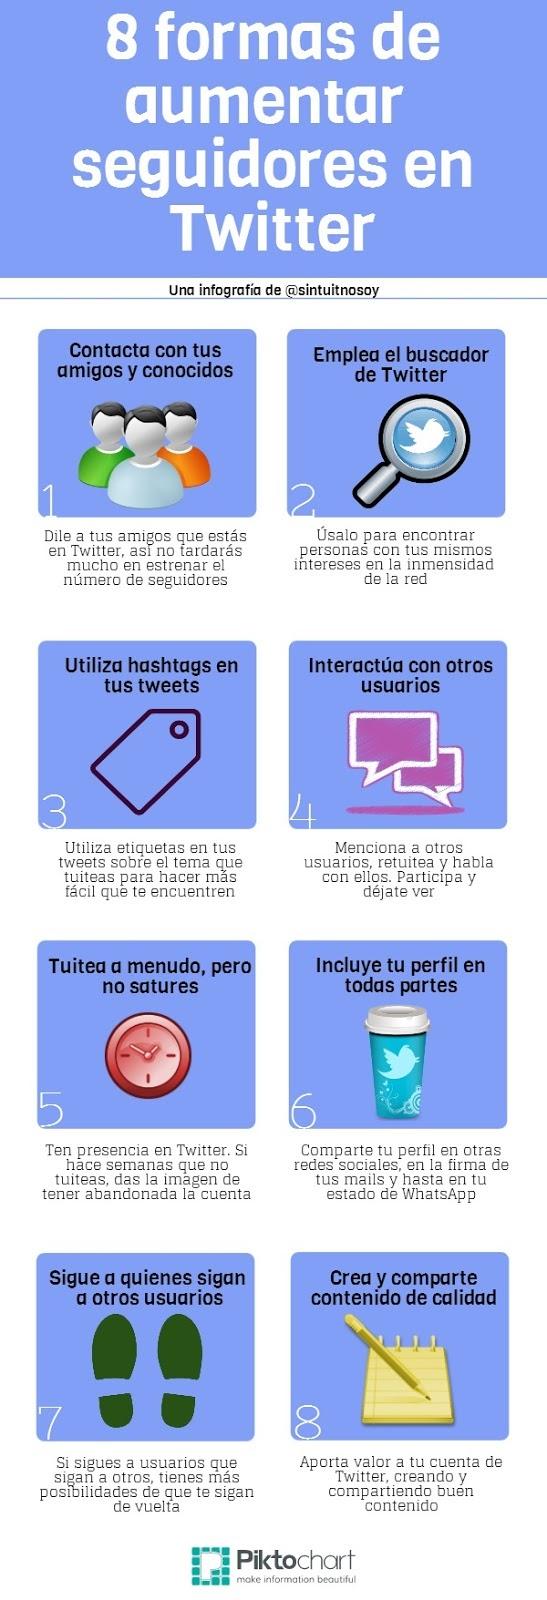 8 formas de aumentar seguidores en Twitter (Infografía)